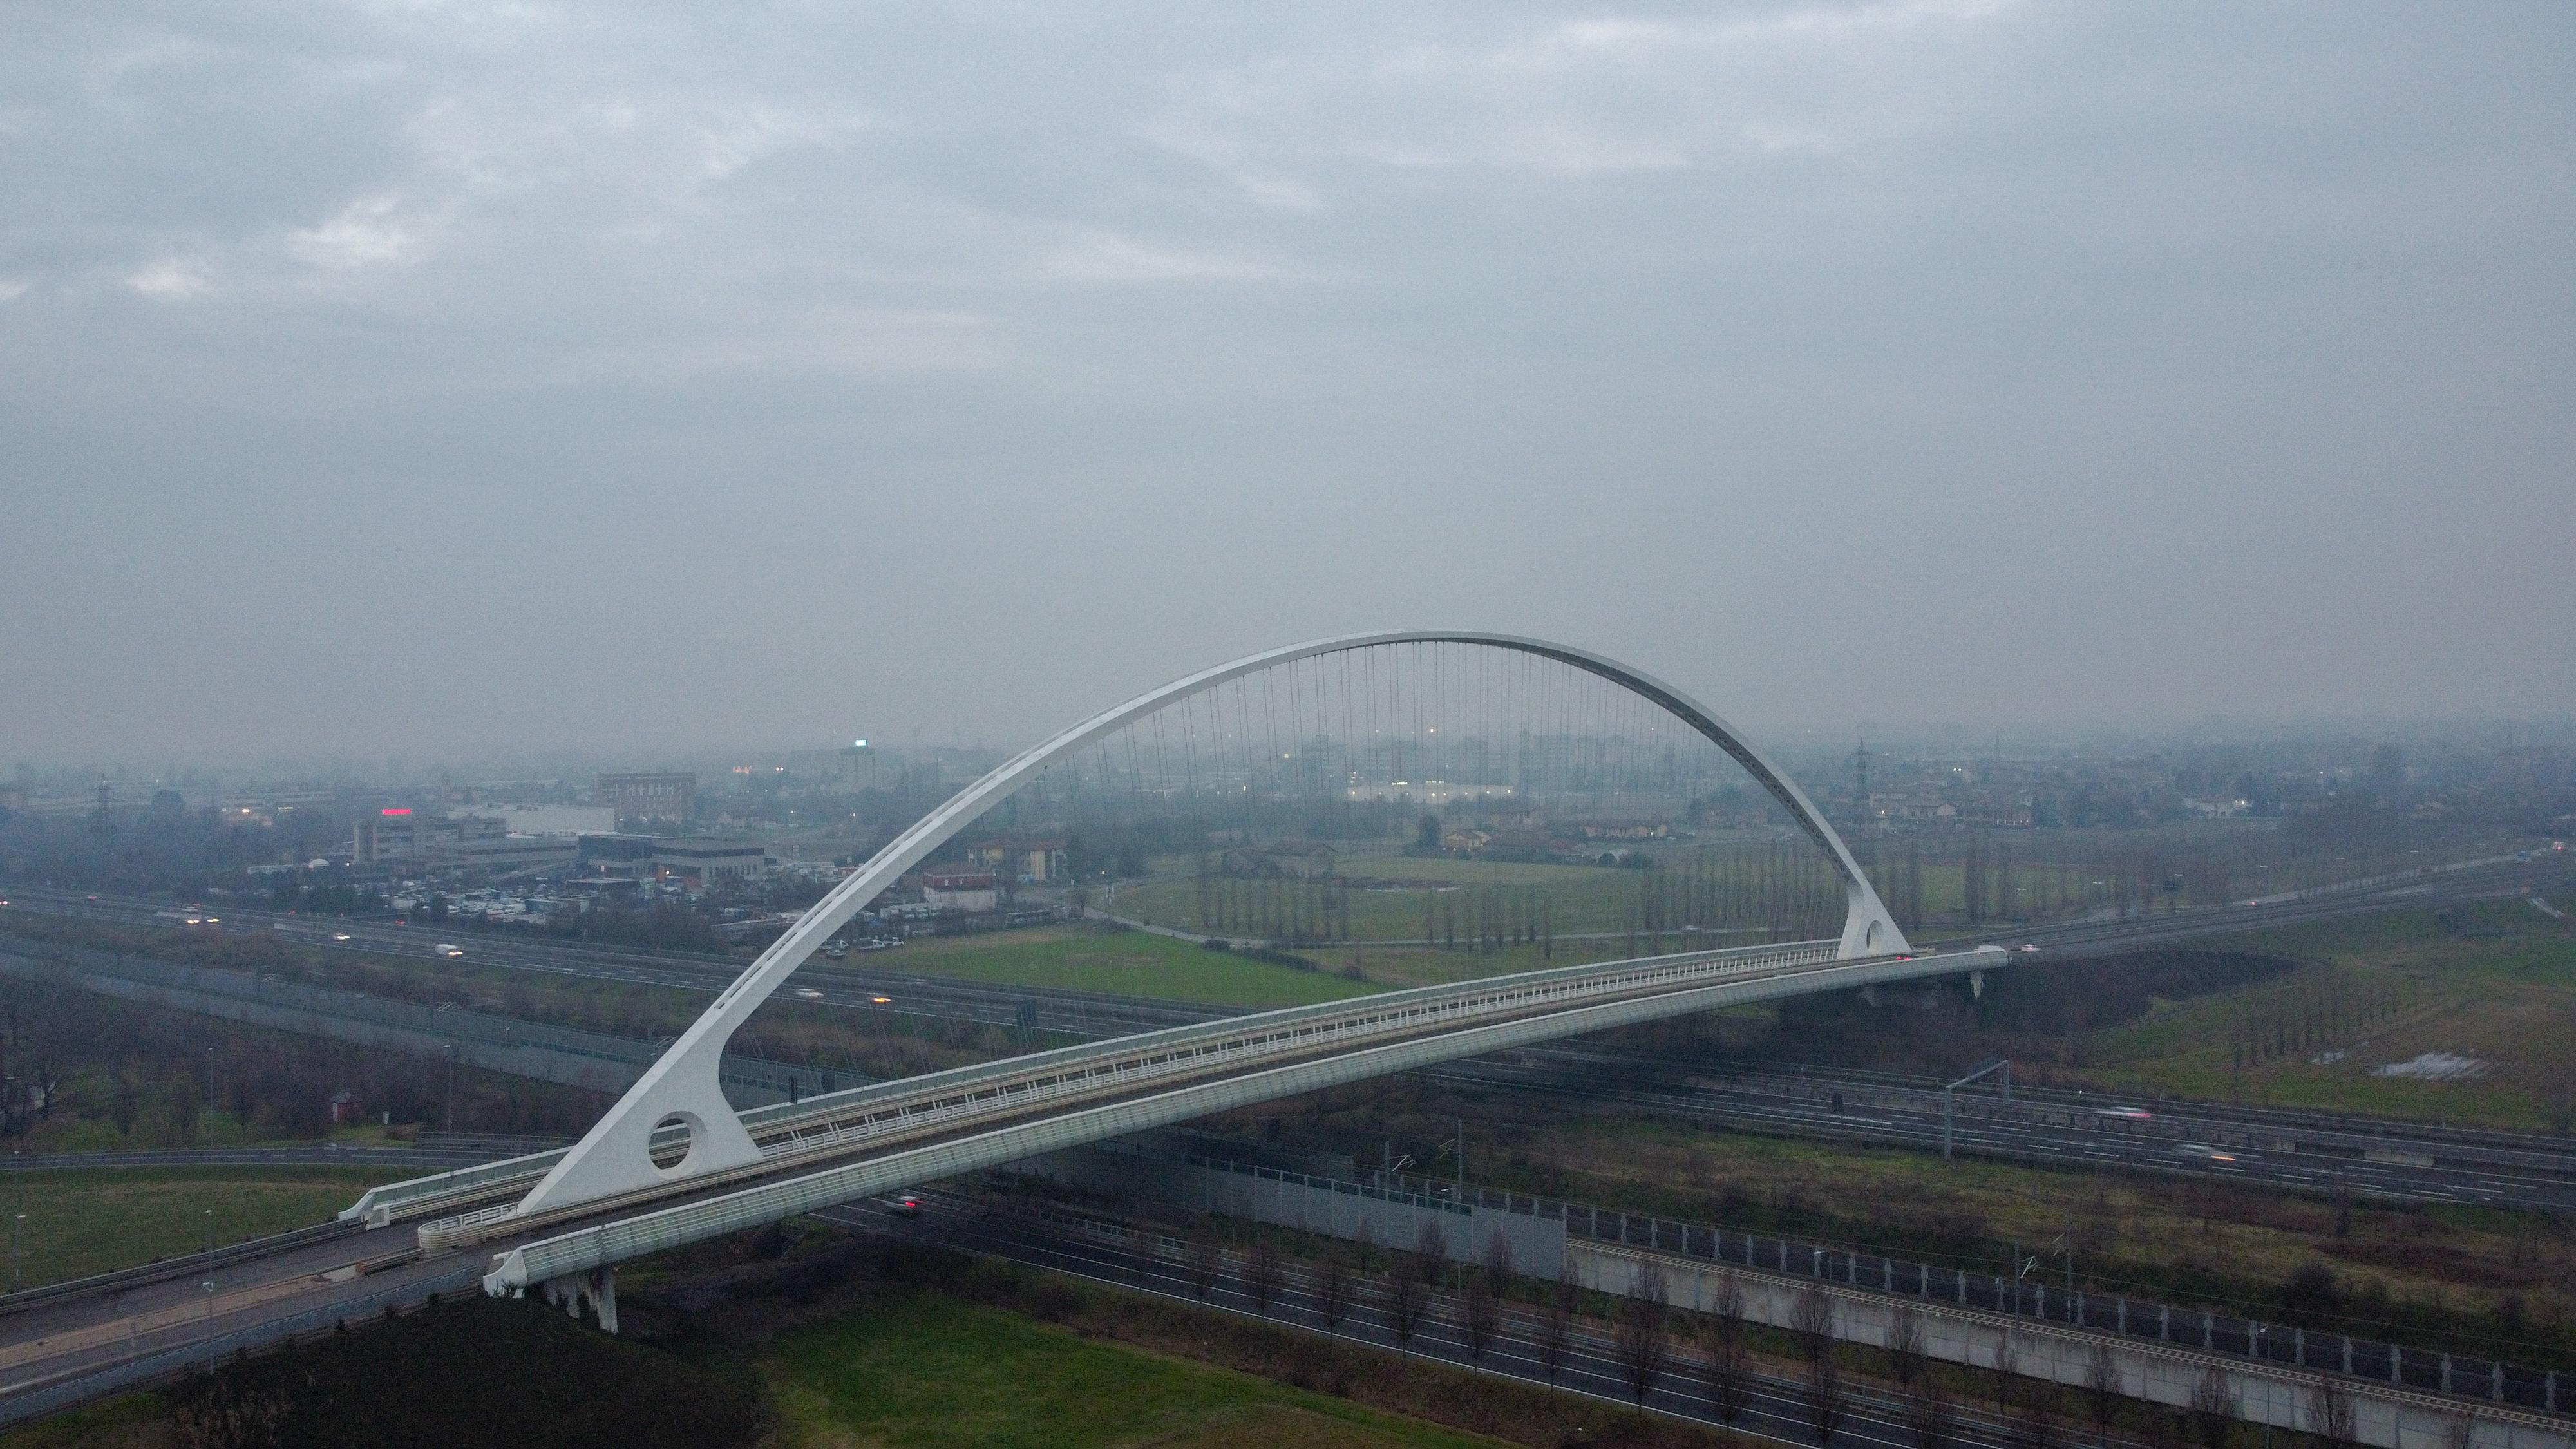 File:Ponte-centrale.jpg - Wikimedia Commons